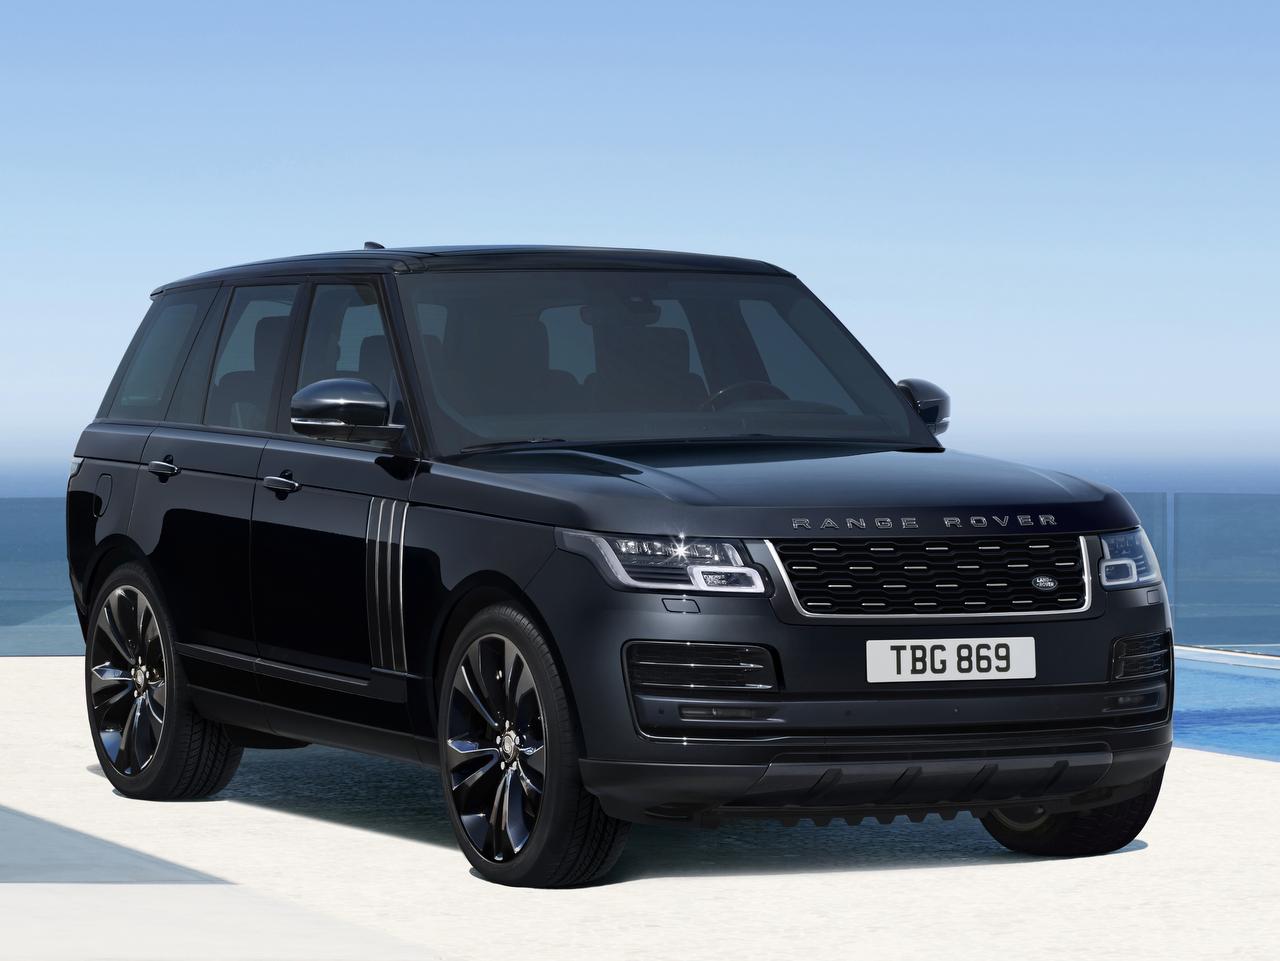 Range Rover SV Autobiography Black Stealth